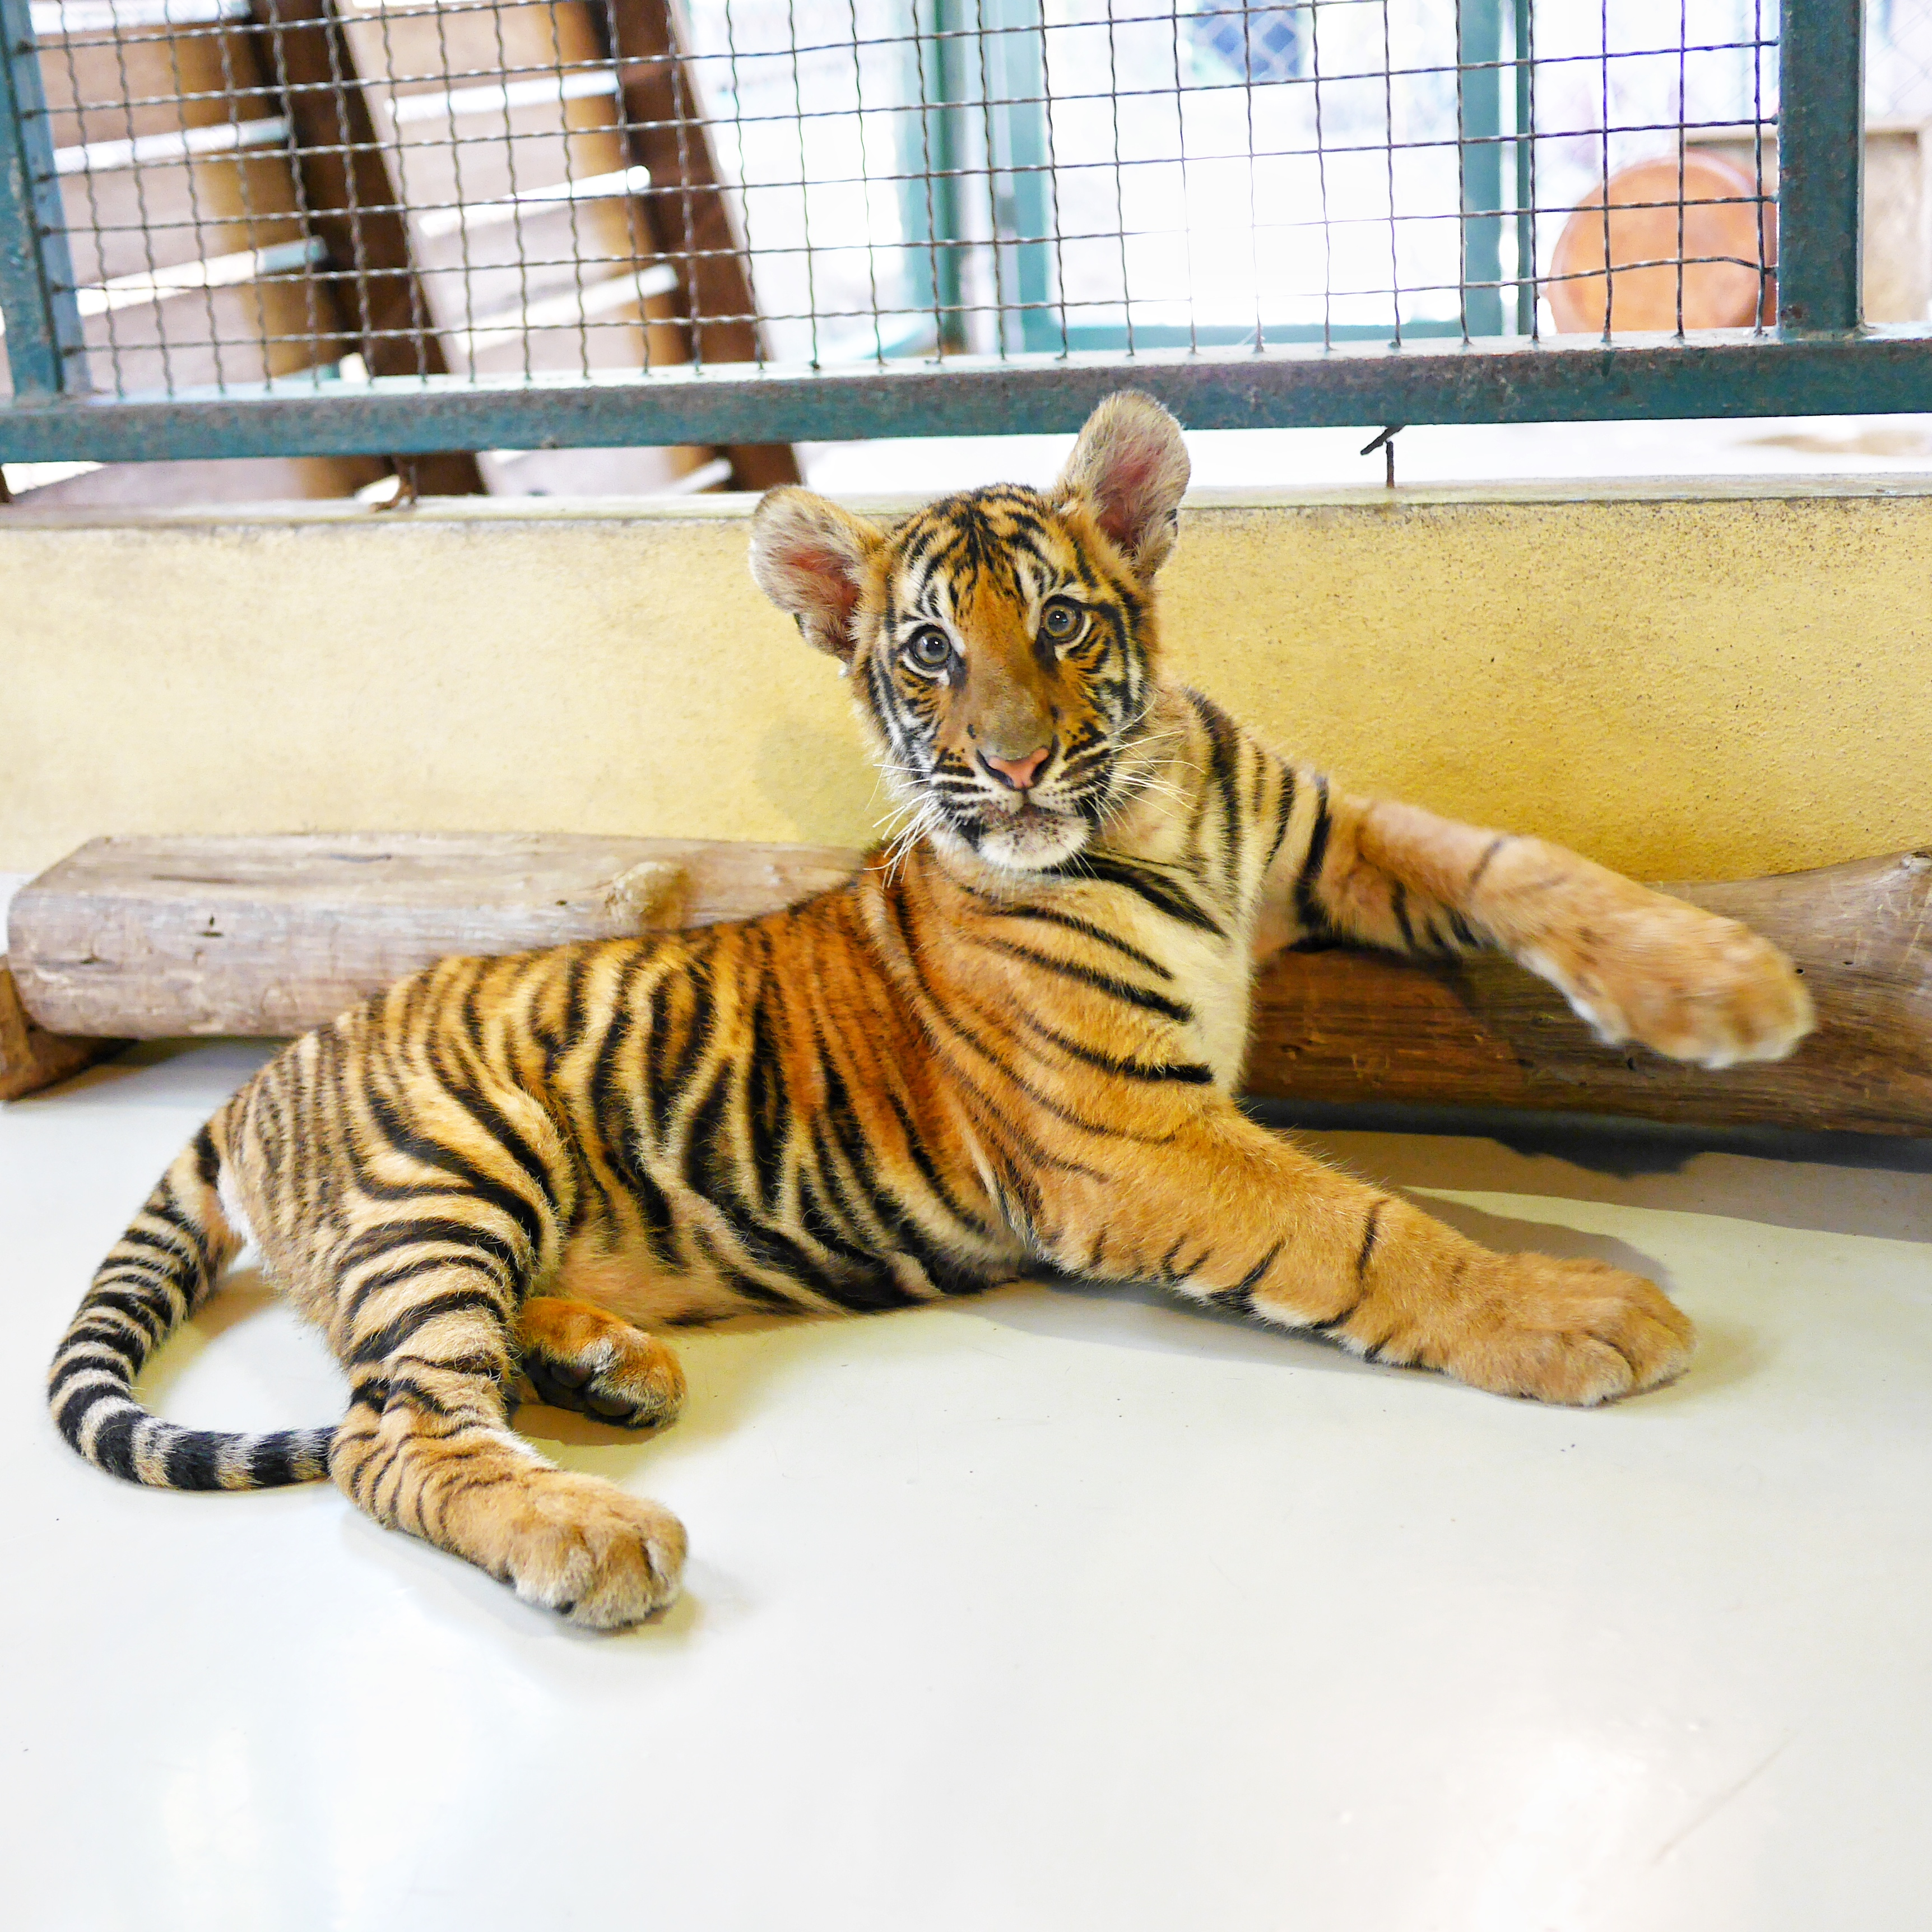 Tiger cub Tiger Kingdom Chiang Mai thesweetwanderlust.com